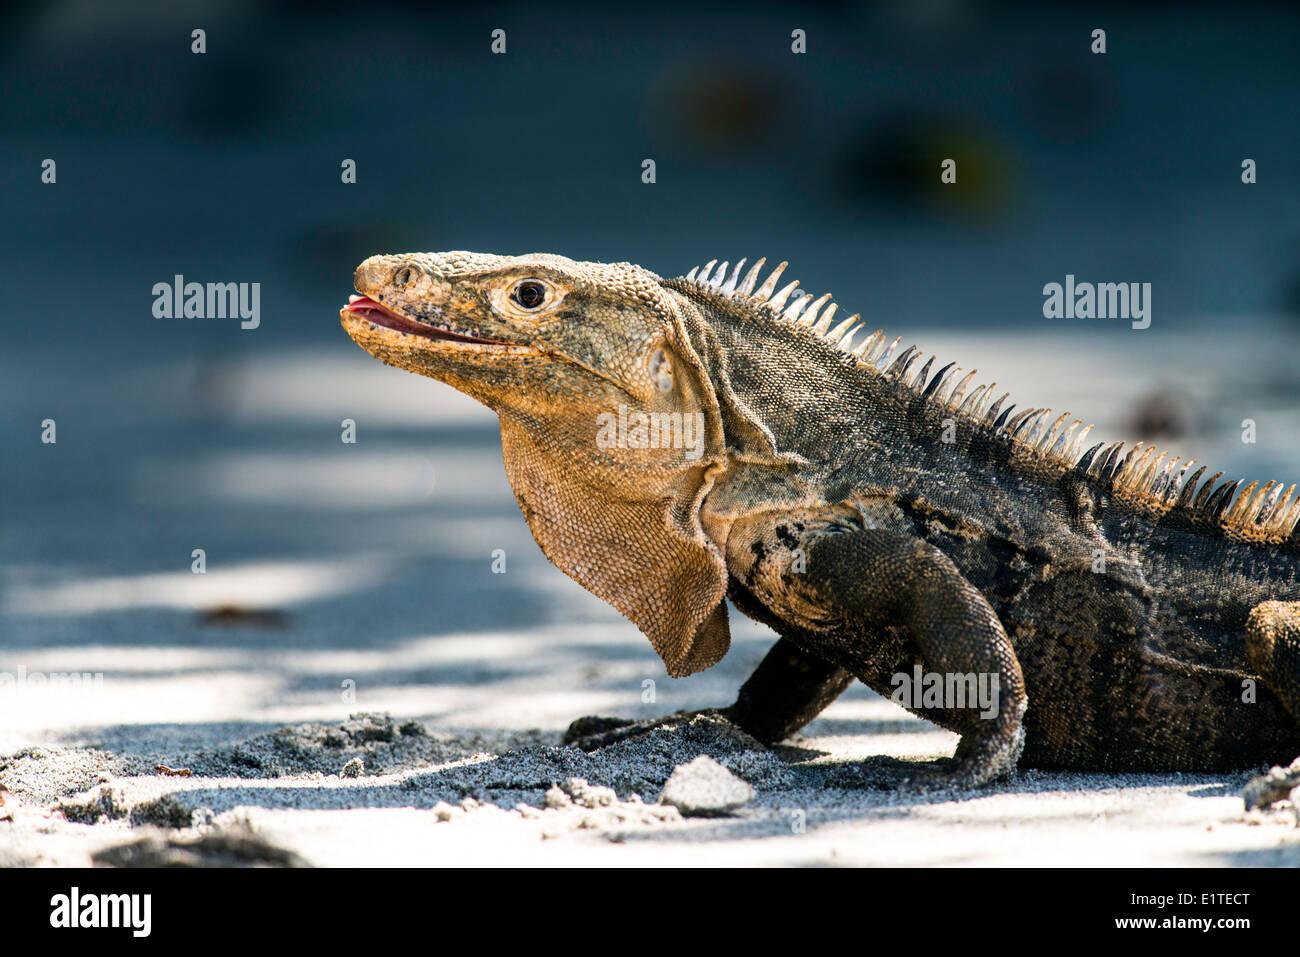 Black iguana Ctenosaura similis reptile Manuel Antonio National Park Costa Rica - Stock Image